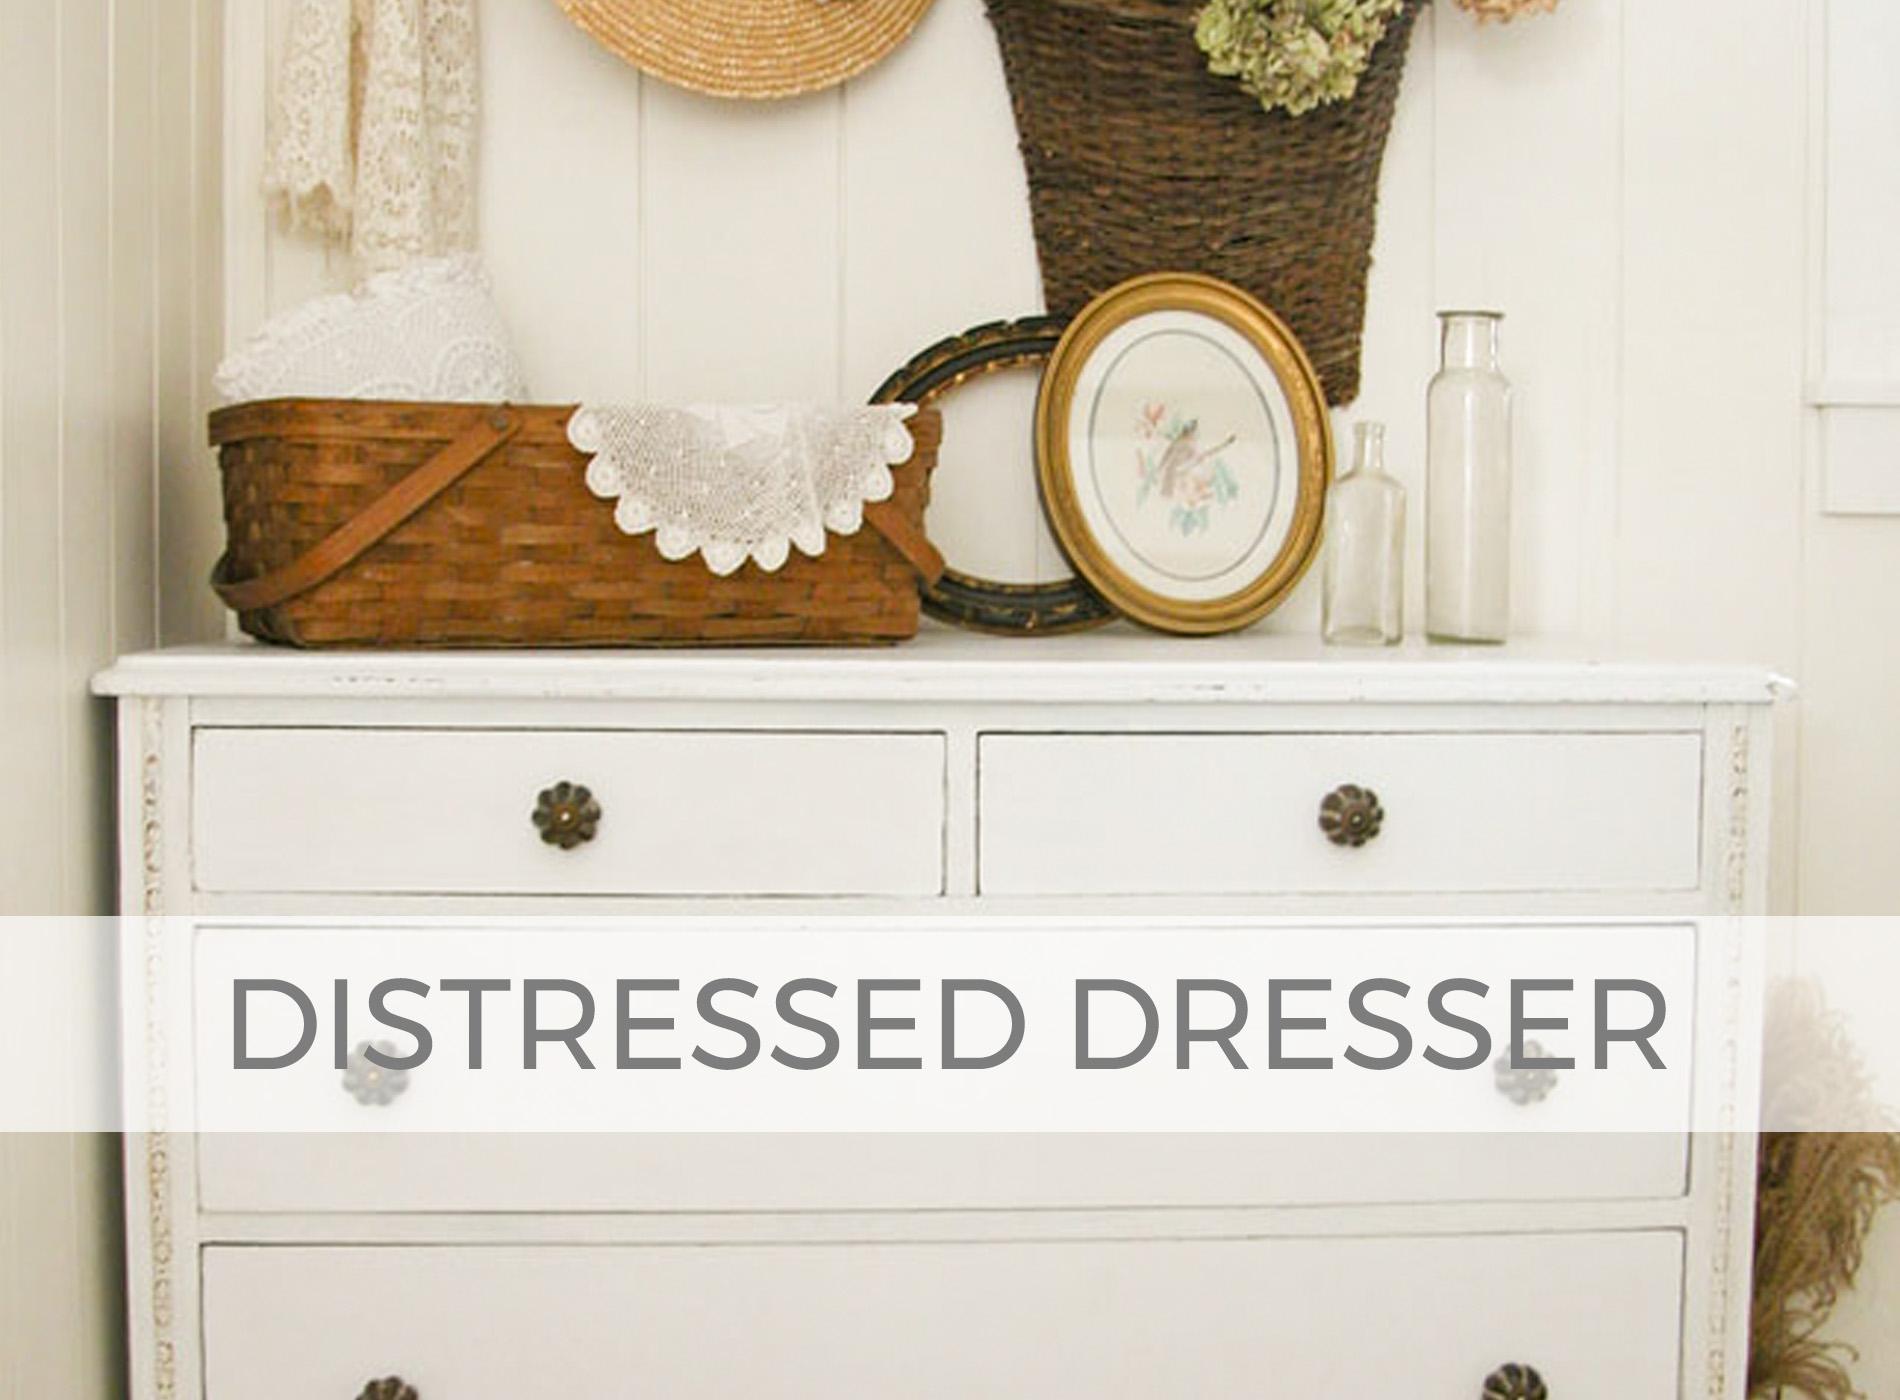 Distressed Dresser by Larissa of Prodigal Pieces | prodigalpieces.com